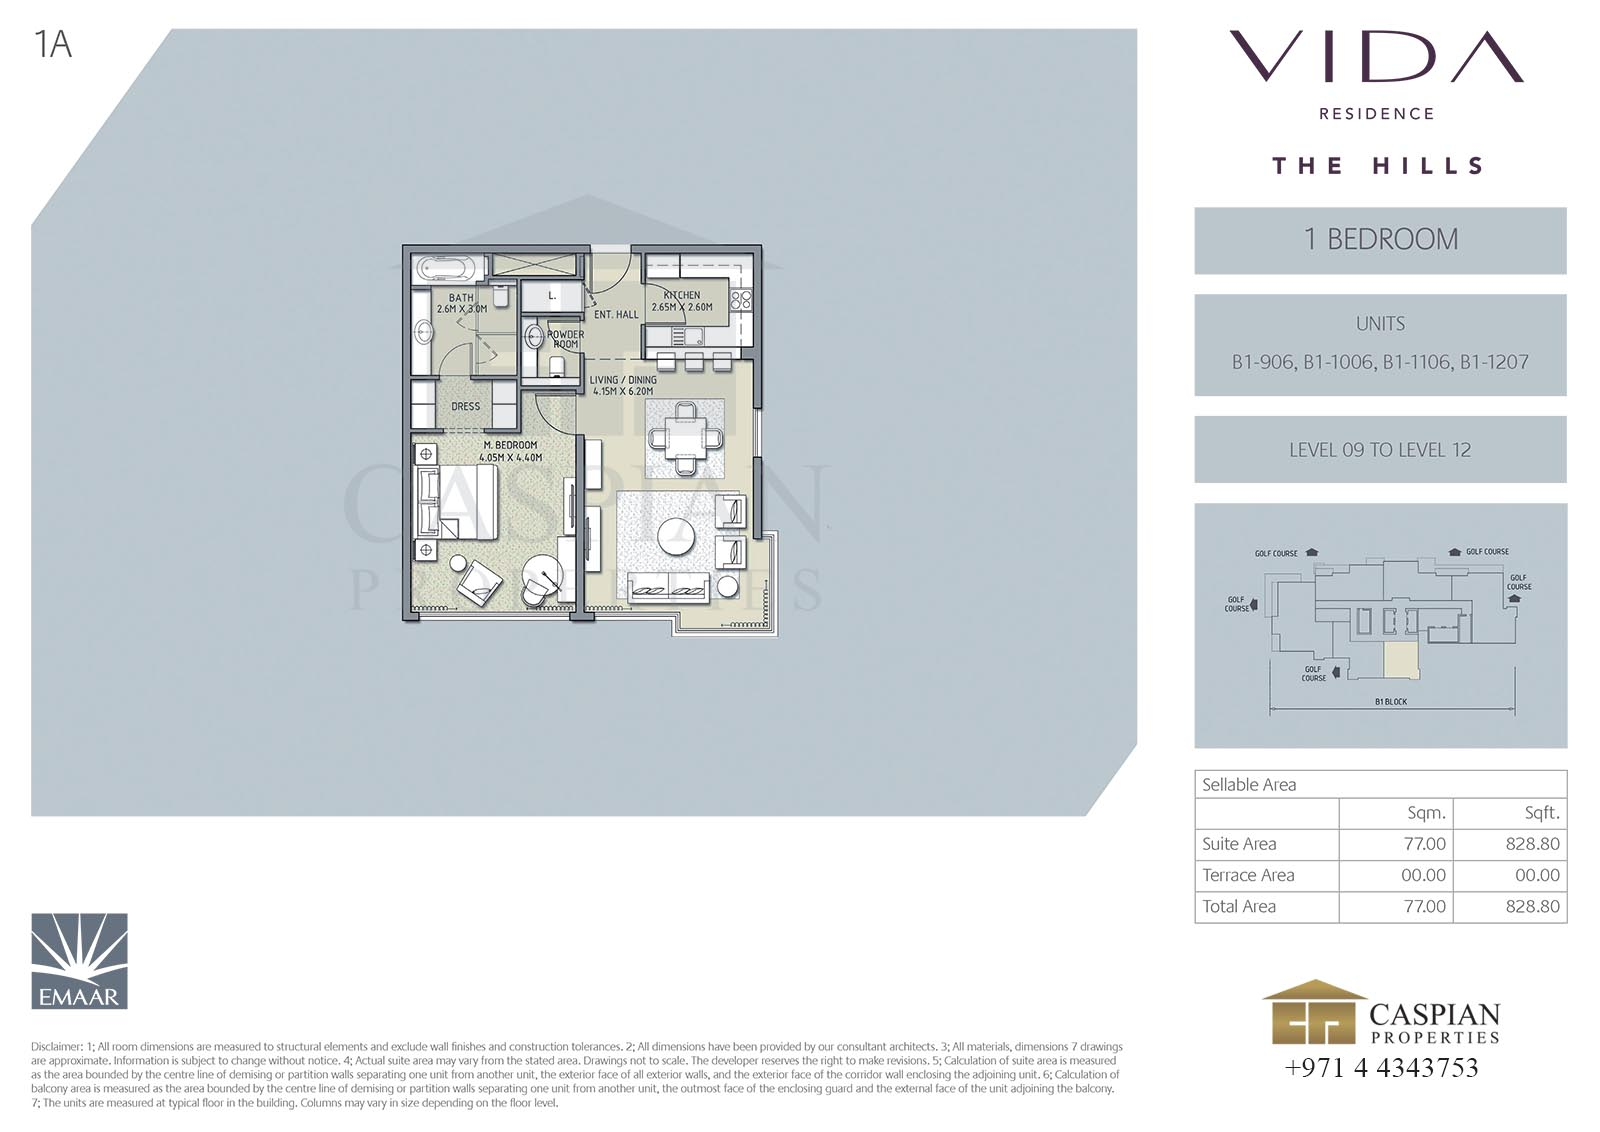 Vida Residence The Hills Floor Plans